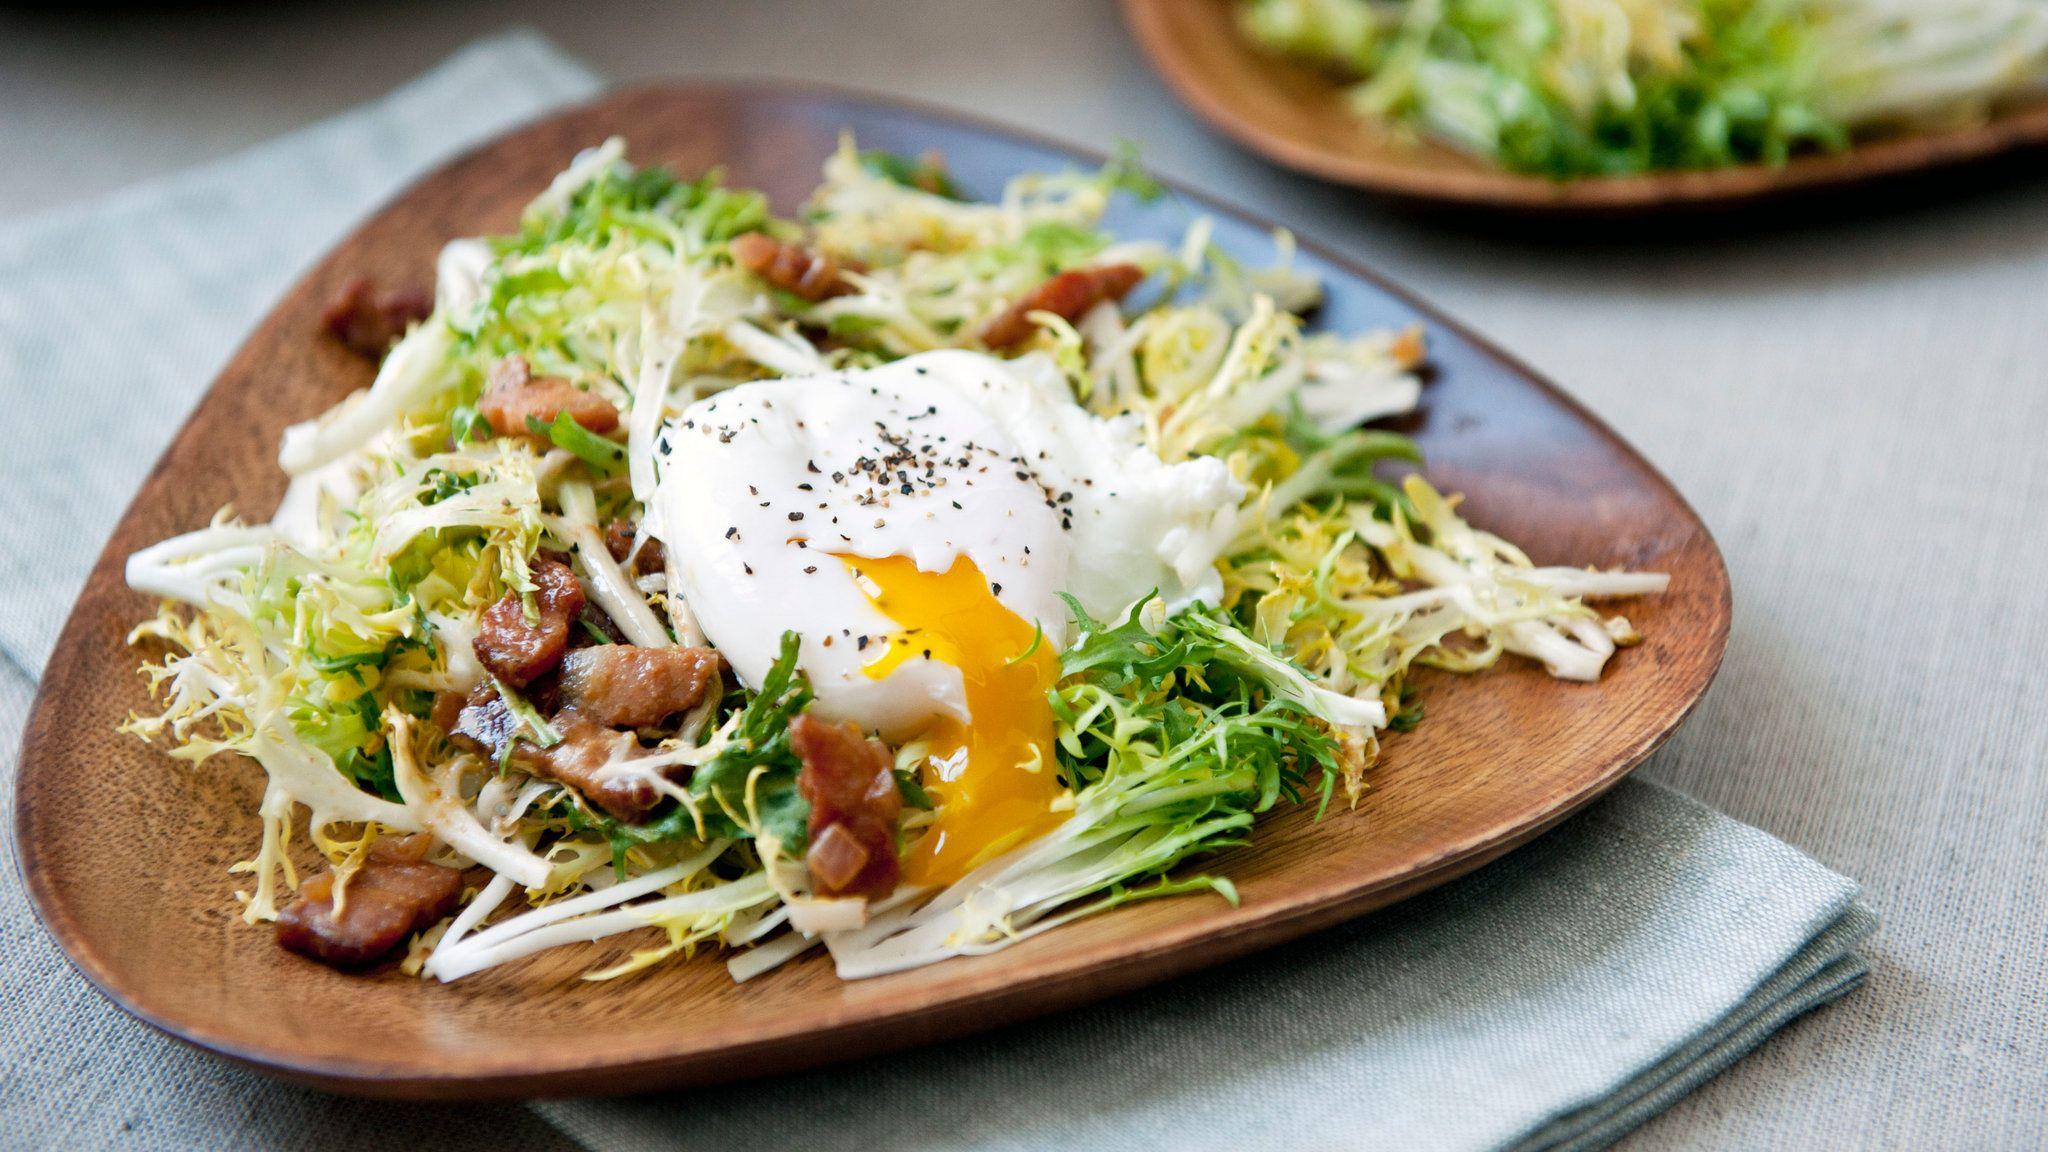 NYT Cooking: Salade Lyonnaise